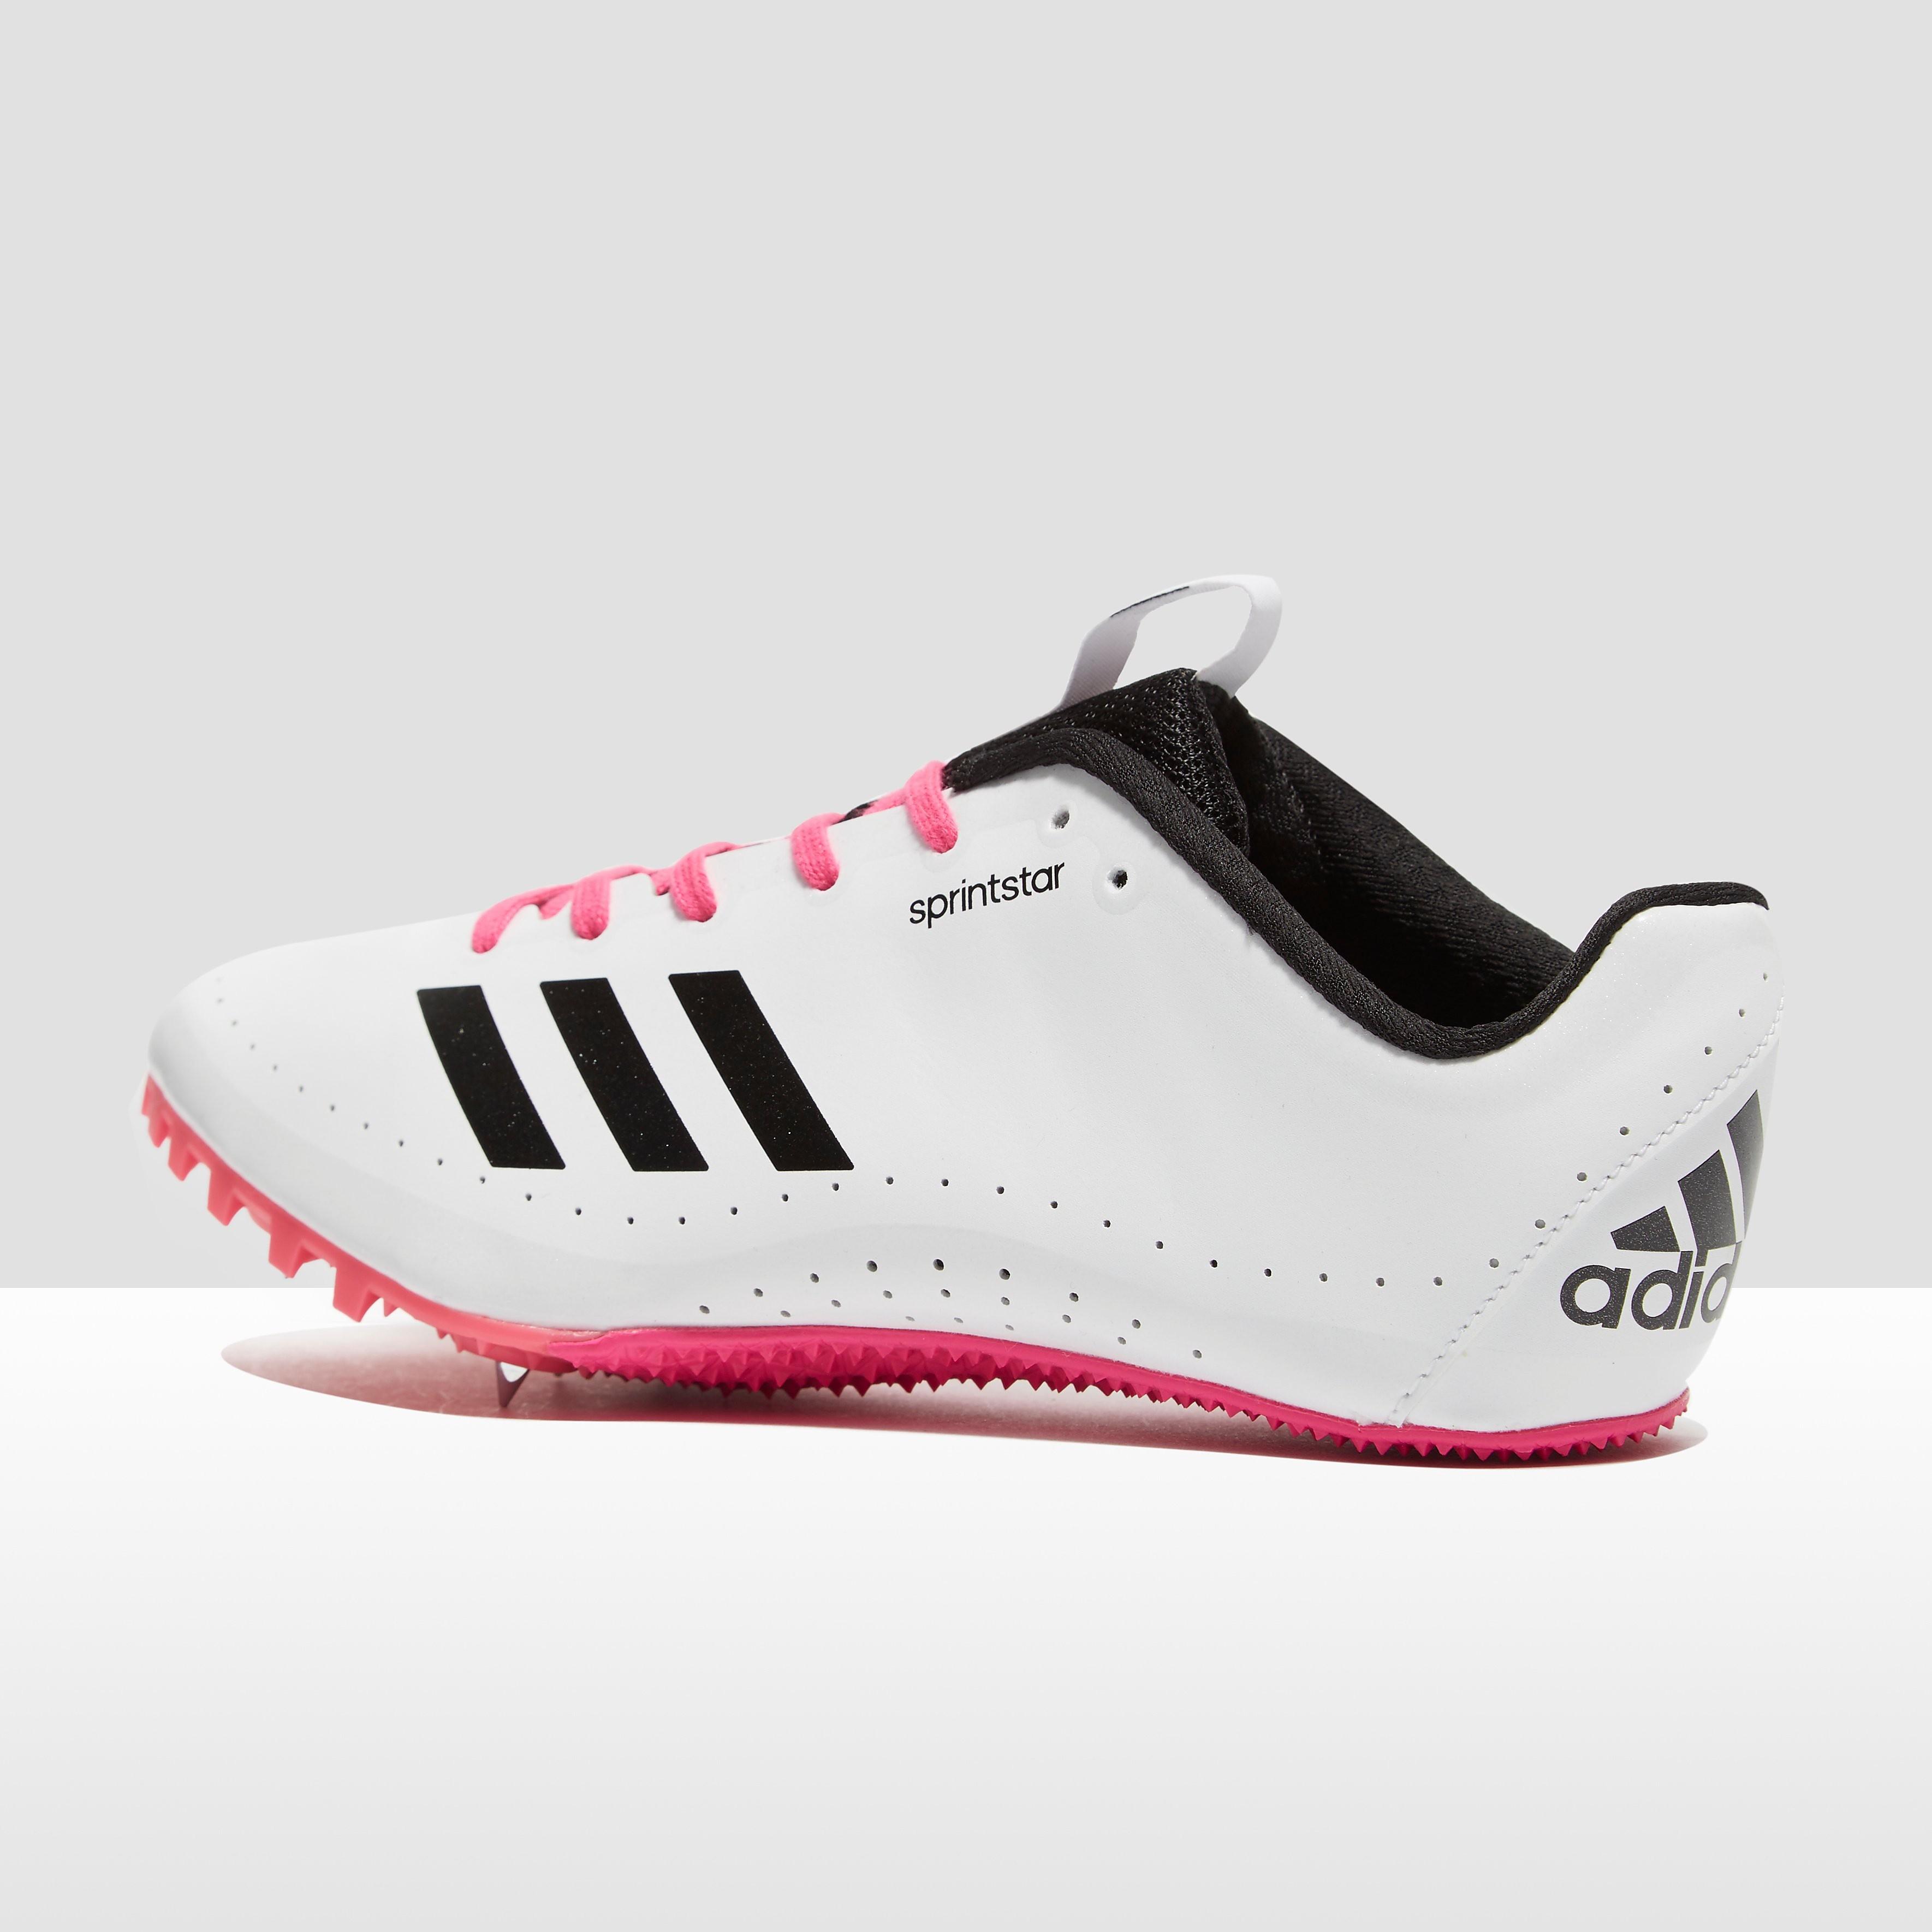 adidas Sprintstar Women's Running Spikes